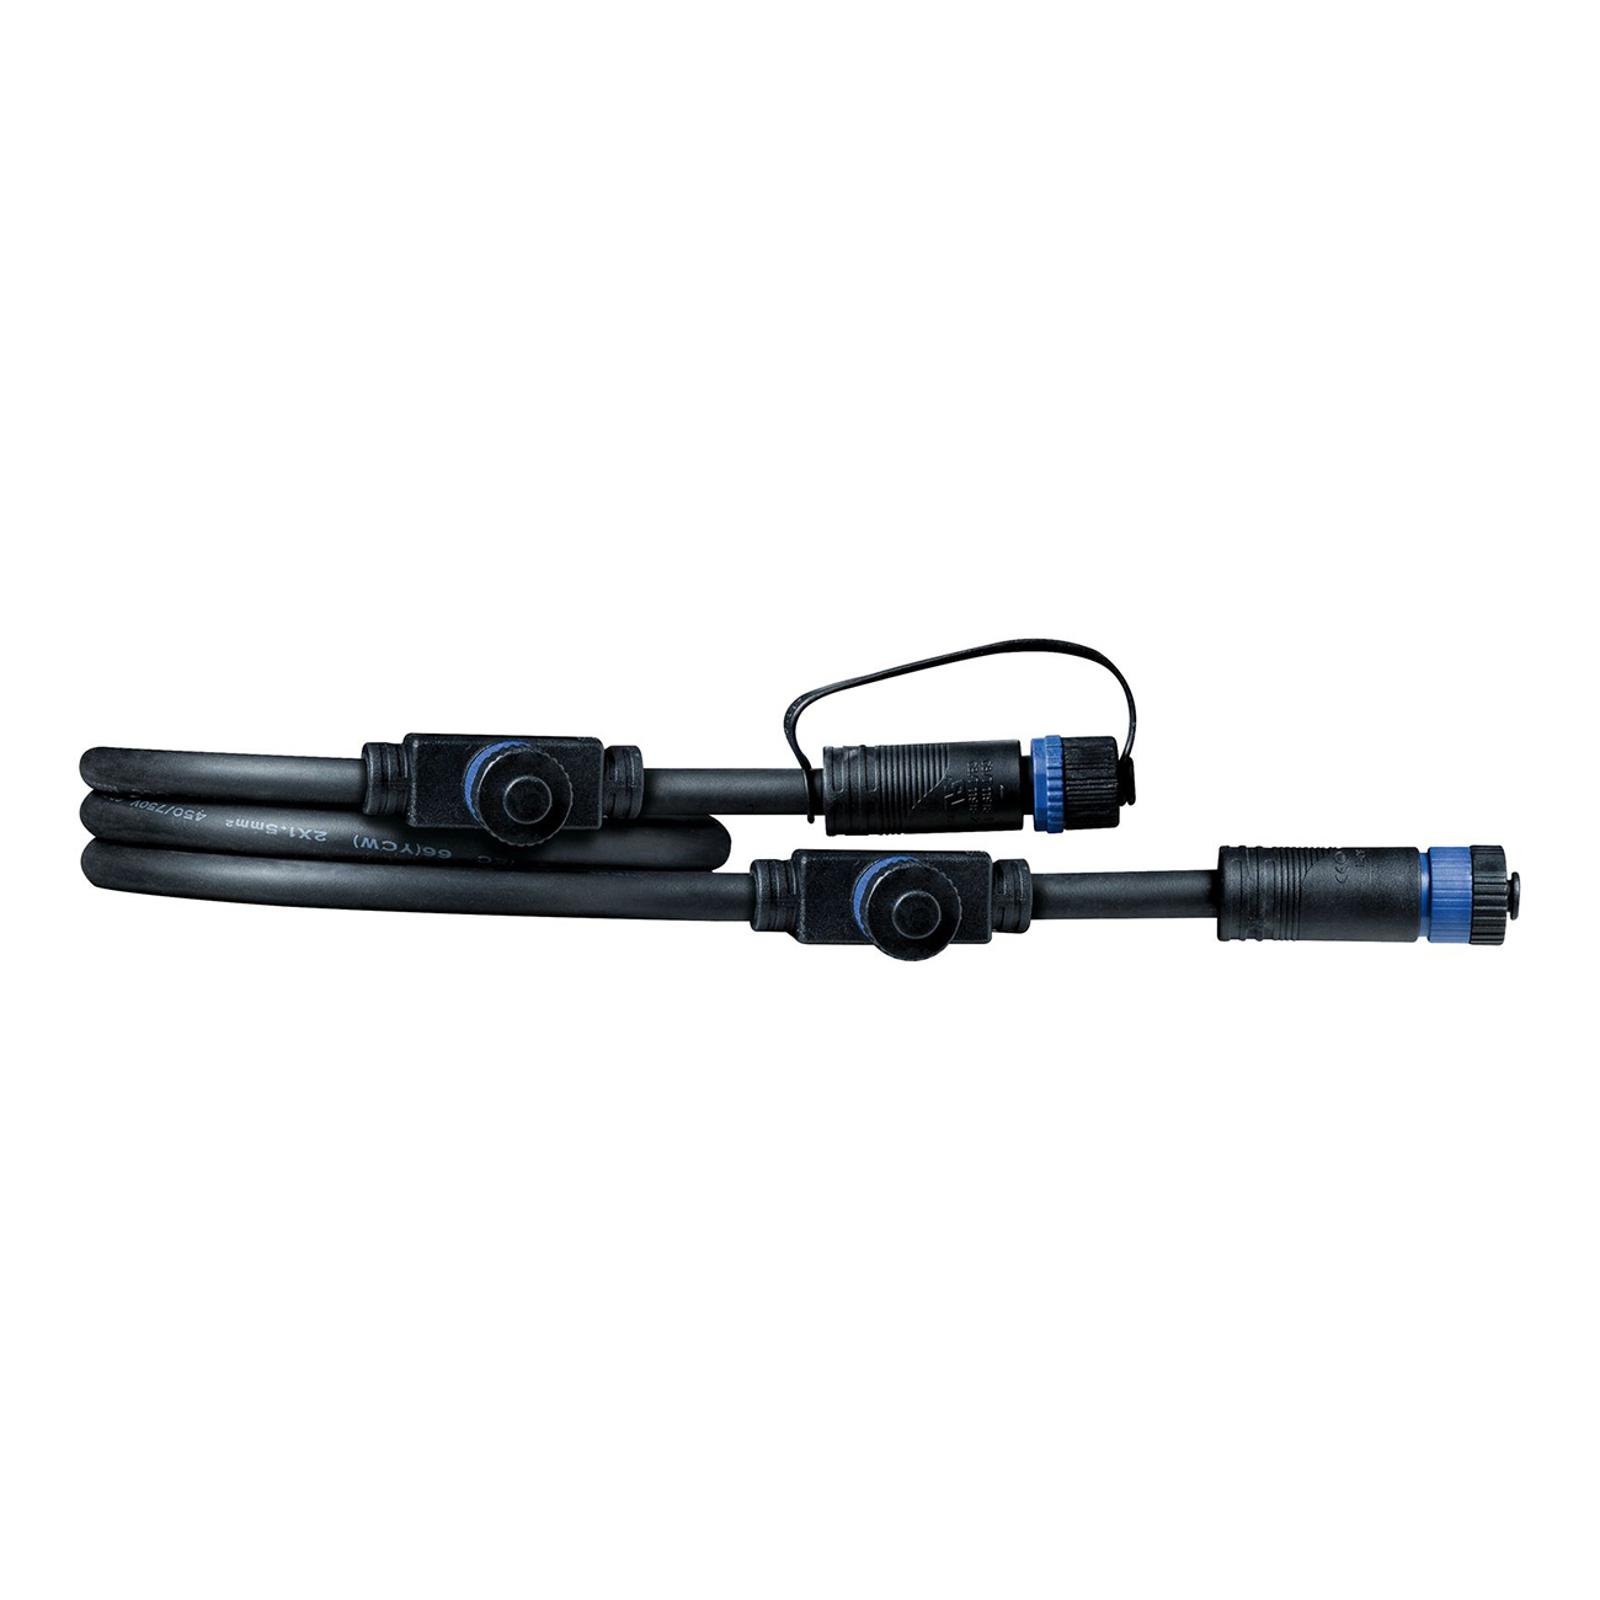 Paulmann Plug & Shine 93994 kabel 1 m, 1 in/3 ut